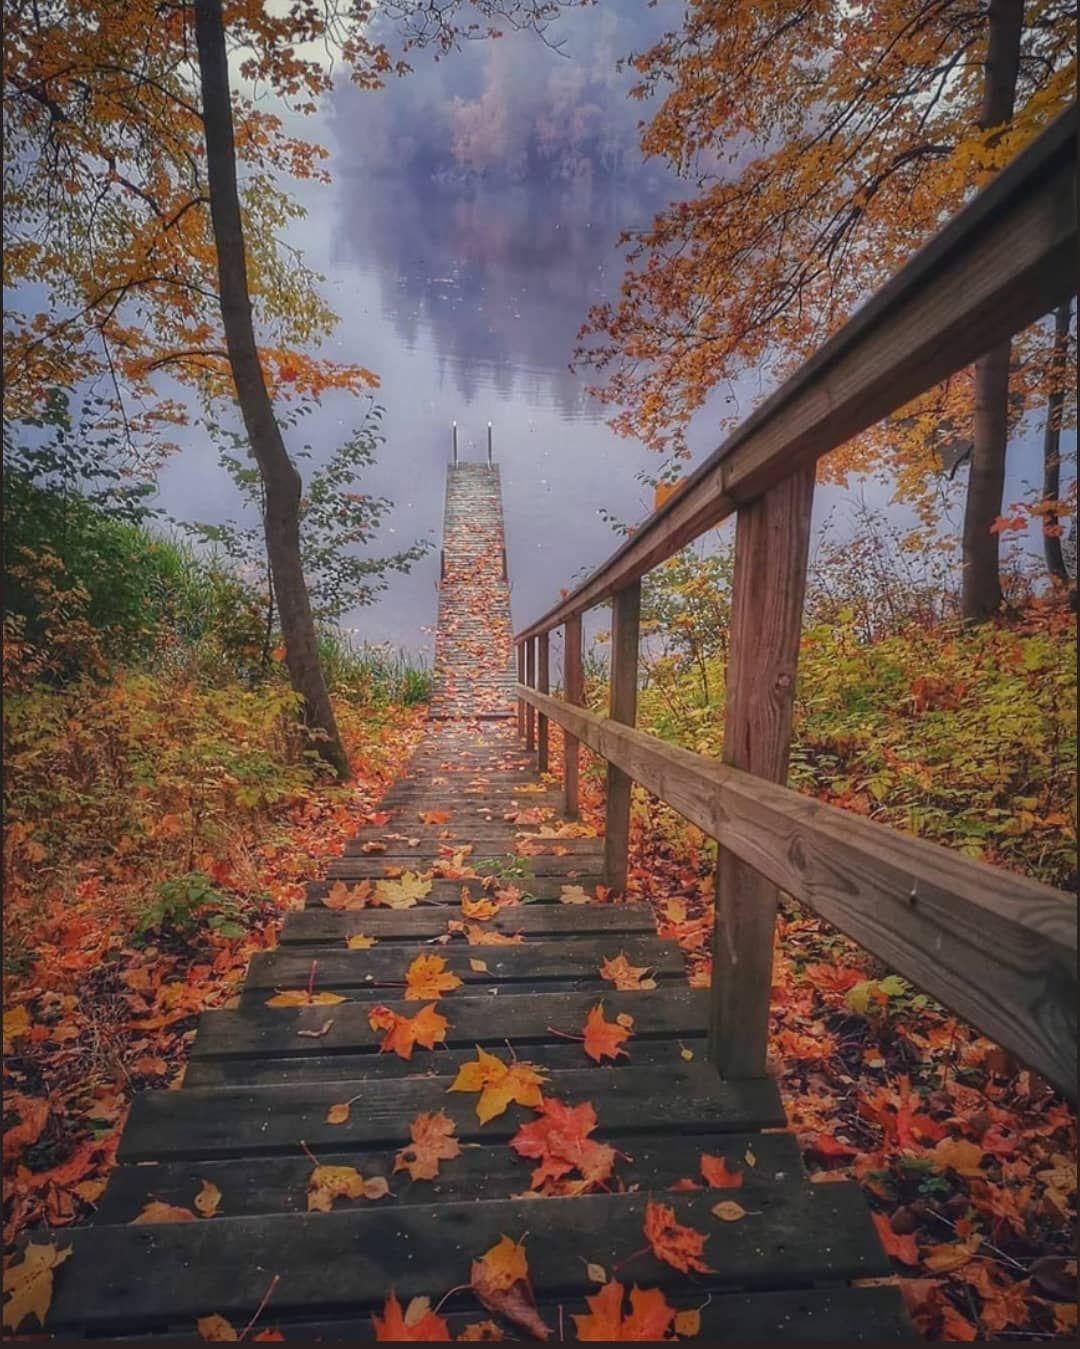 #magicpict#nature_perfection#dametraveler#heatercentral#bevisuallyinspired#agameoftones#tree_magic#stunning_shots#landscapelovers#travelgram#awesome_photographers#FreedomThinkers#WeLiveToExplore#visualsgang#teamcanon#earthpix#hot_shotz#fantastic_earth#special_shots#worldbestgram#dream_image#fingerprintofgod#shotwithlove#rural_love#photoarena_nature#beautifulplaces#moodygrams#fantastic_earth#igs_photos#naturephotography#ig_enes_